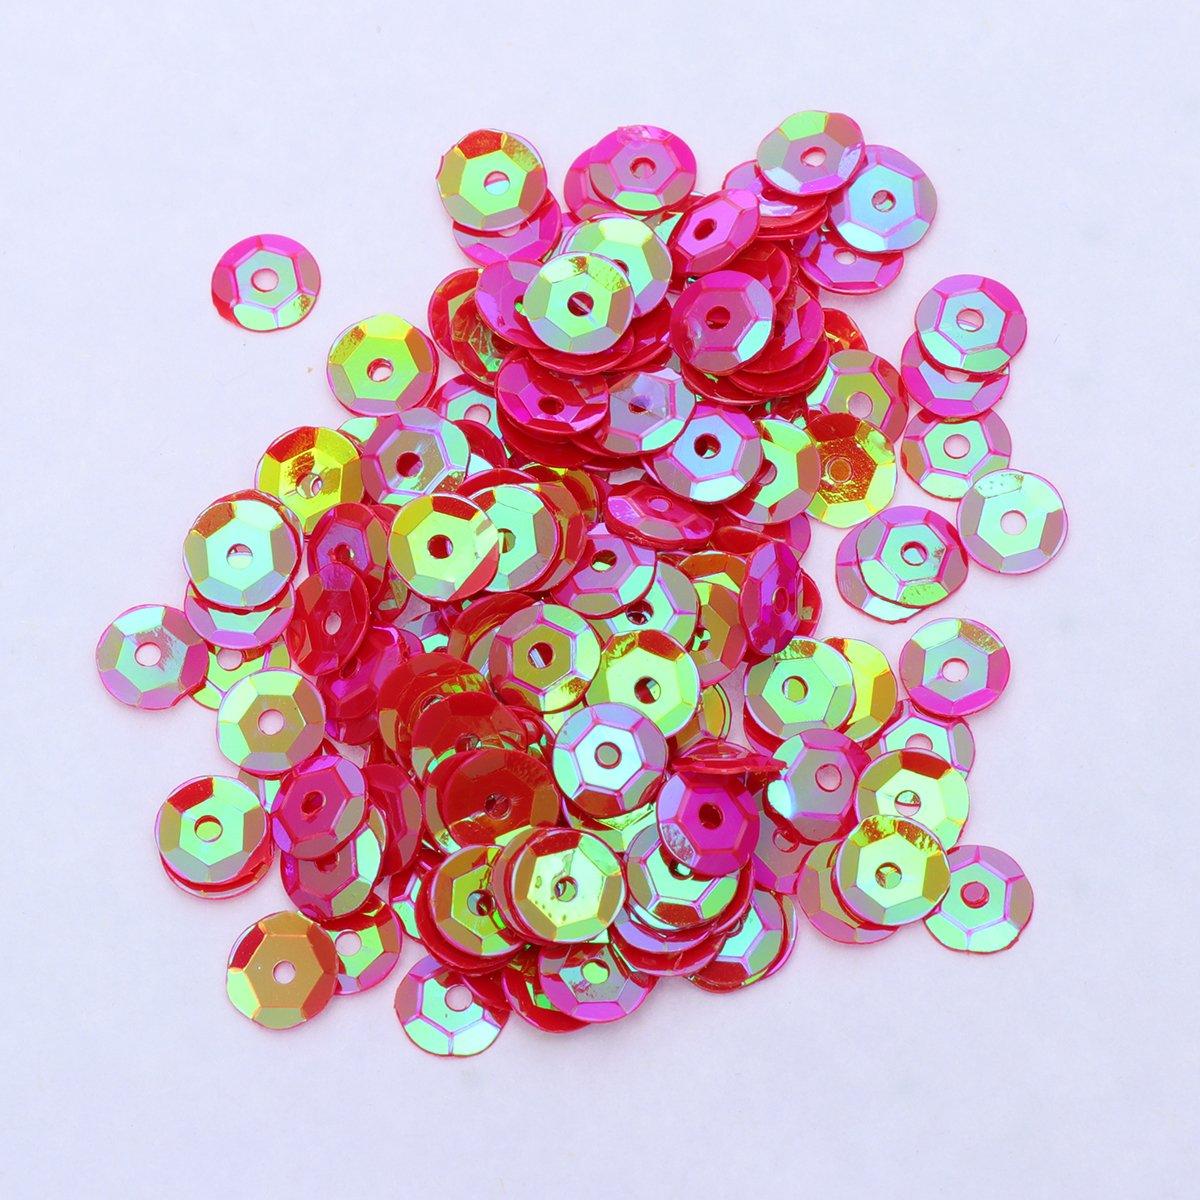 rosenice lentejuelas manualidades purpurina Multicolor para artesan/ía bricolaje decoraci/ón 14/colores